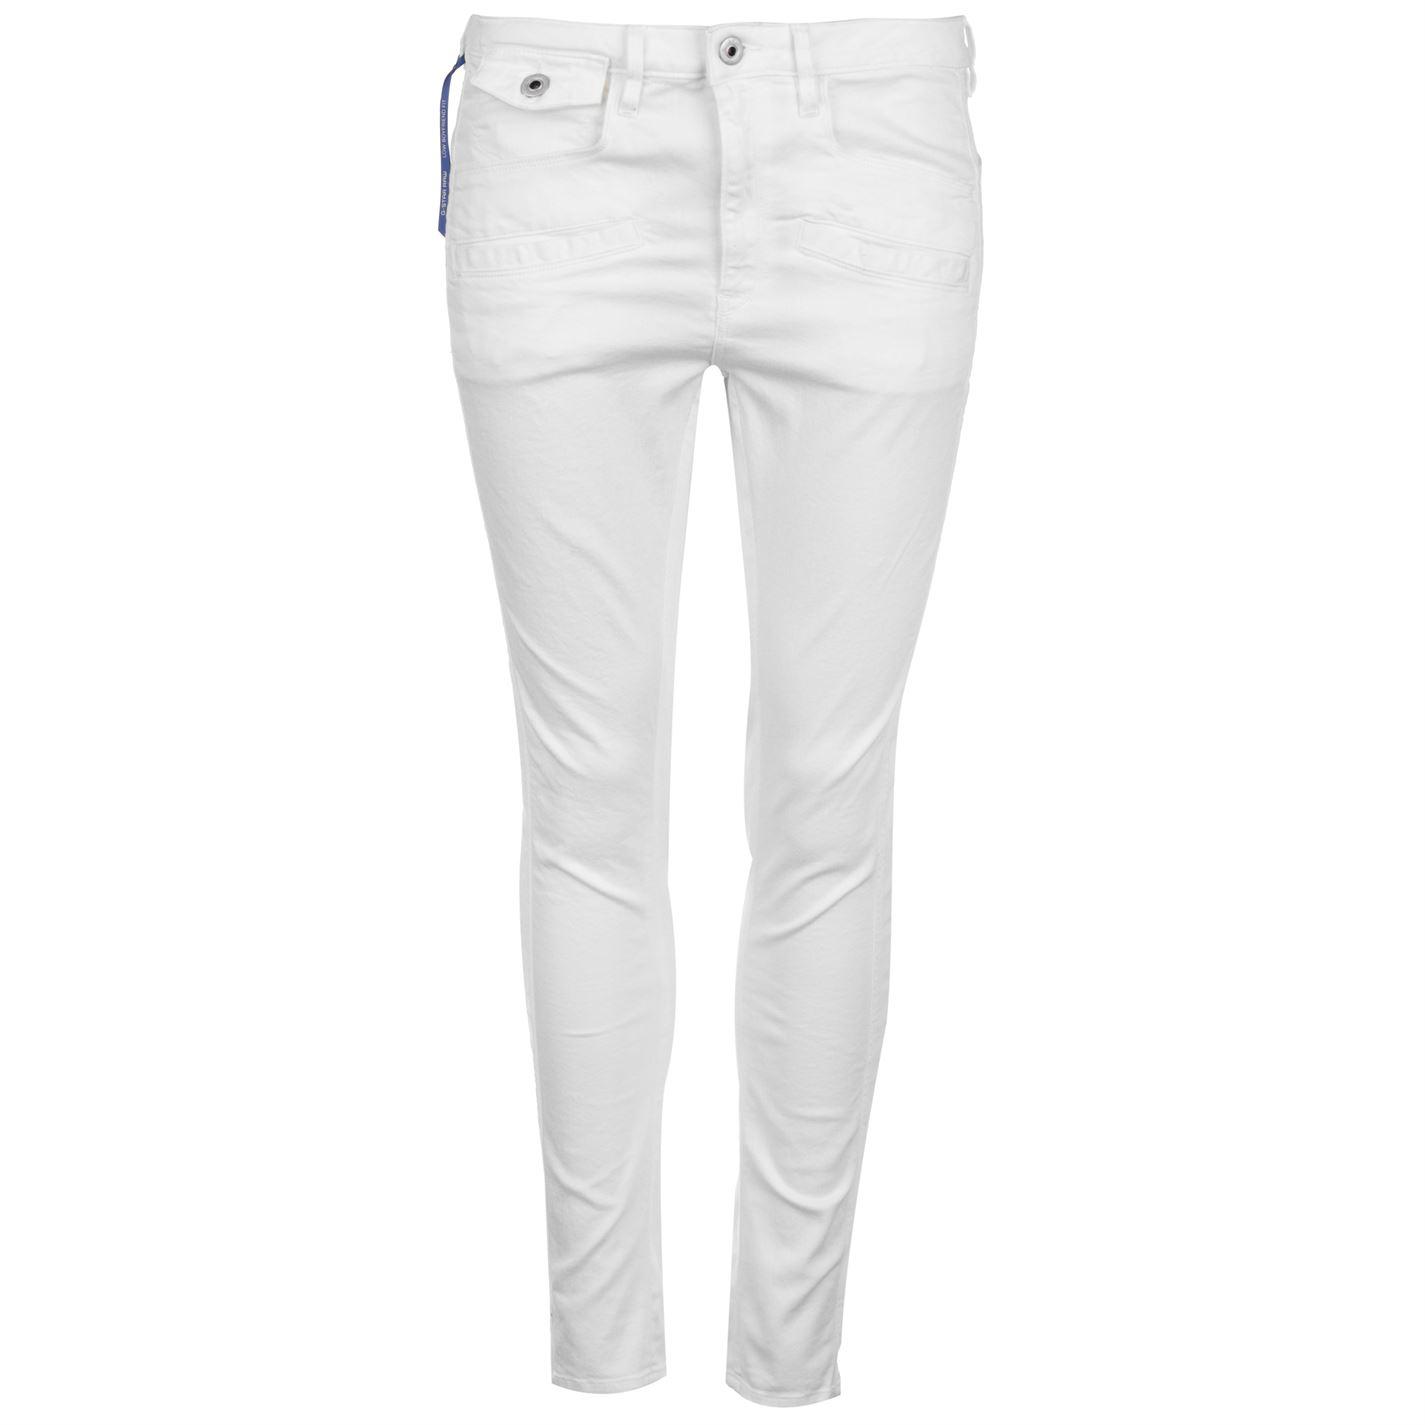 G Star Davin Low Boyfriend Jeans